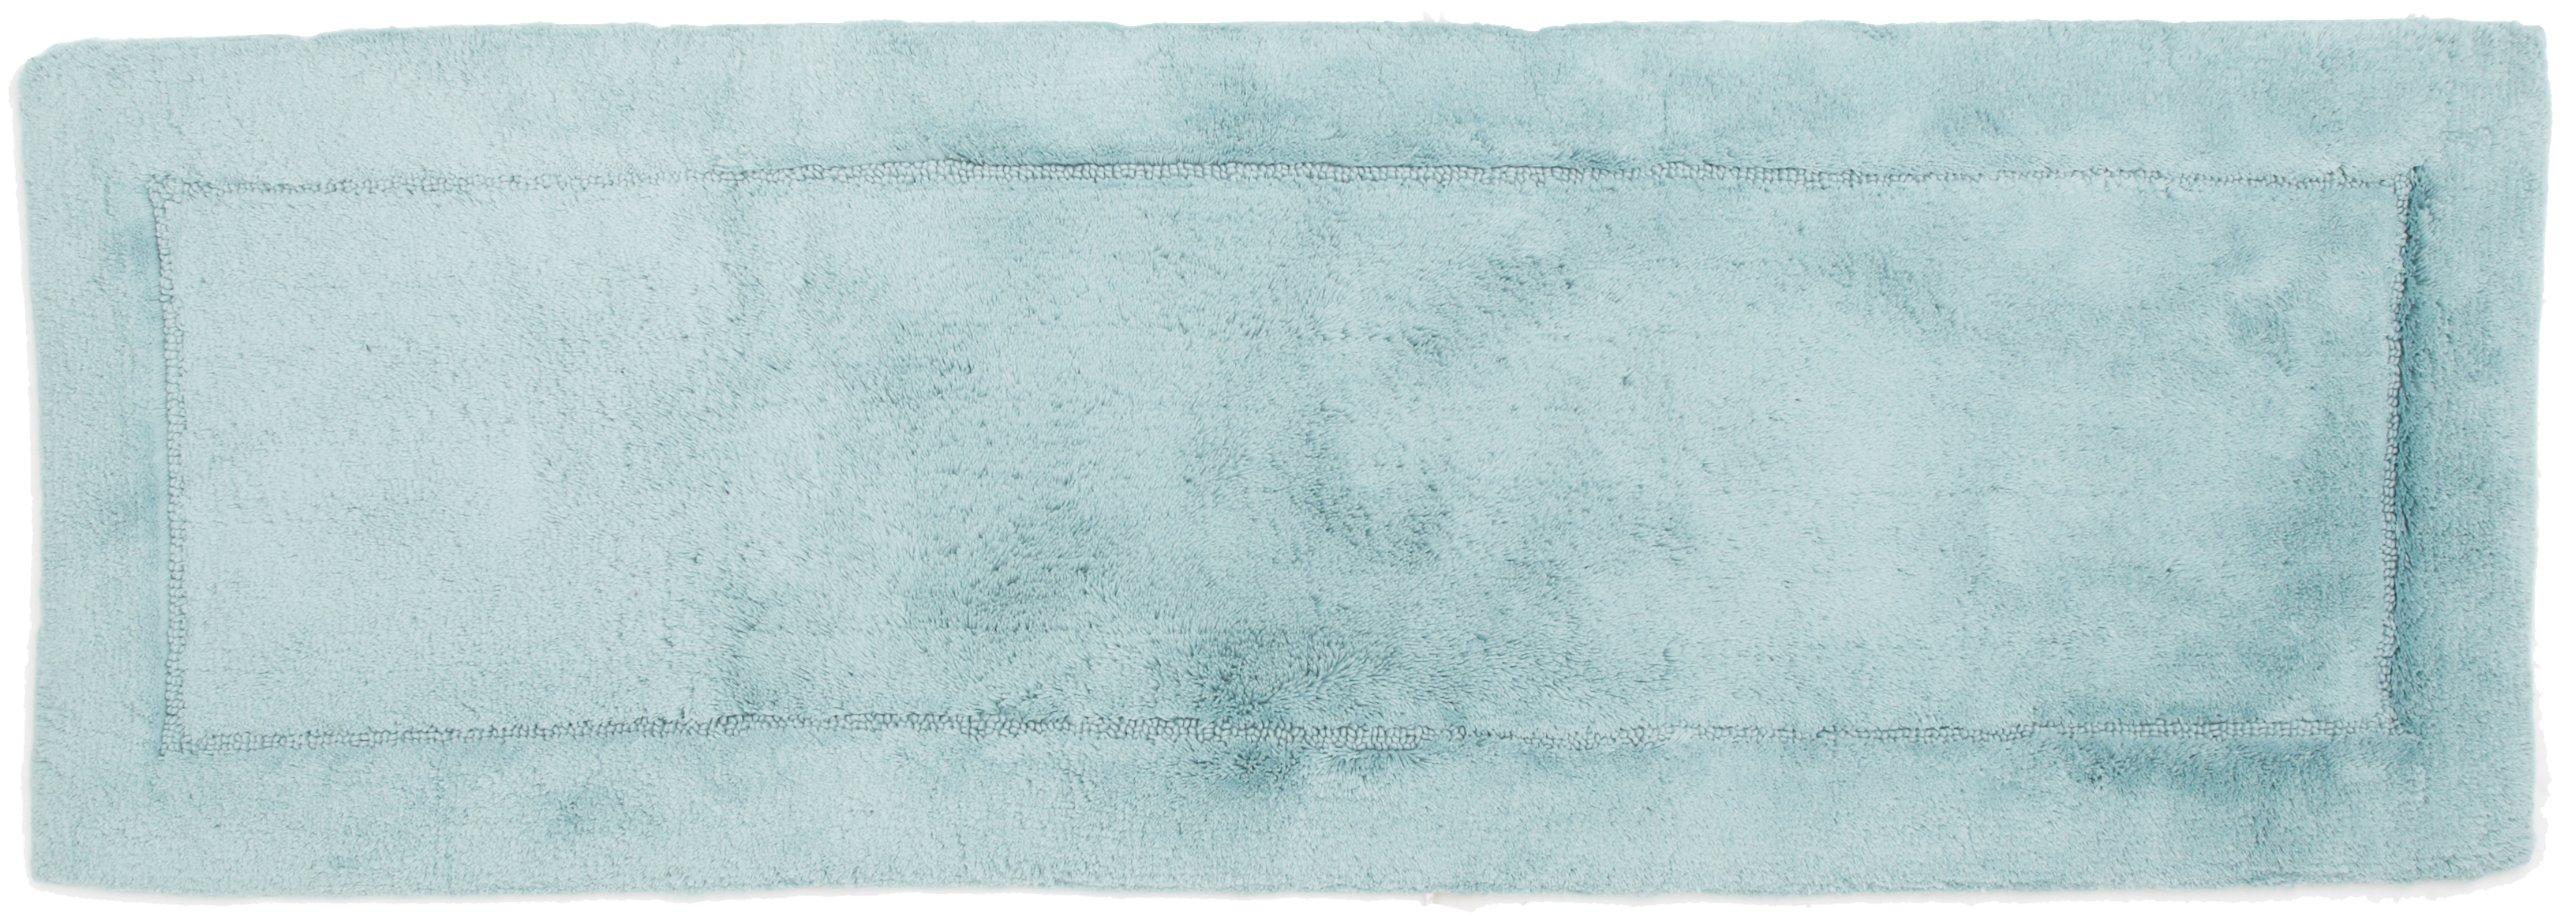 HygroSoft Fast Drying and Absorbent Bath Rug, 21 by 60-Inch, Glacier